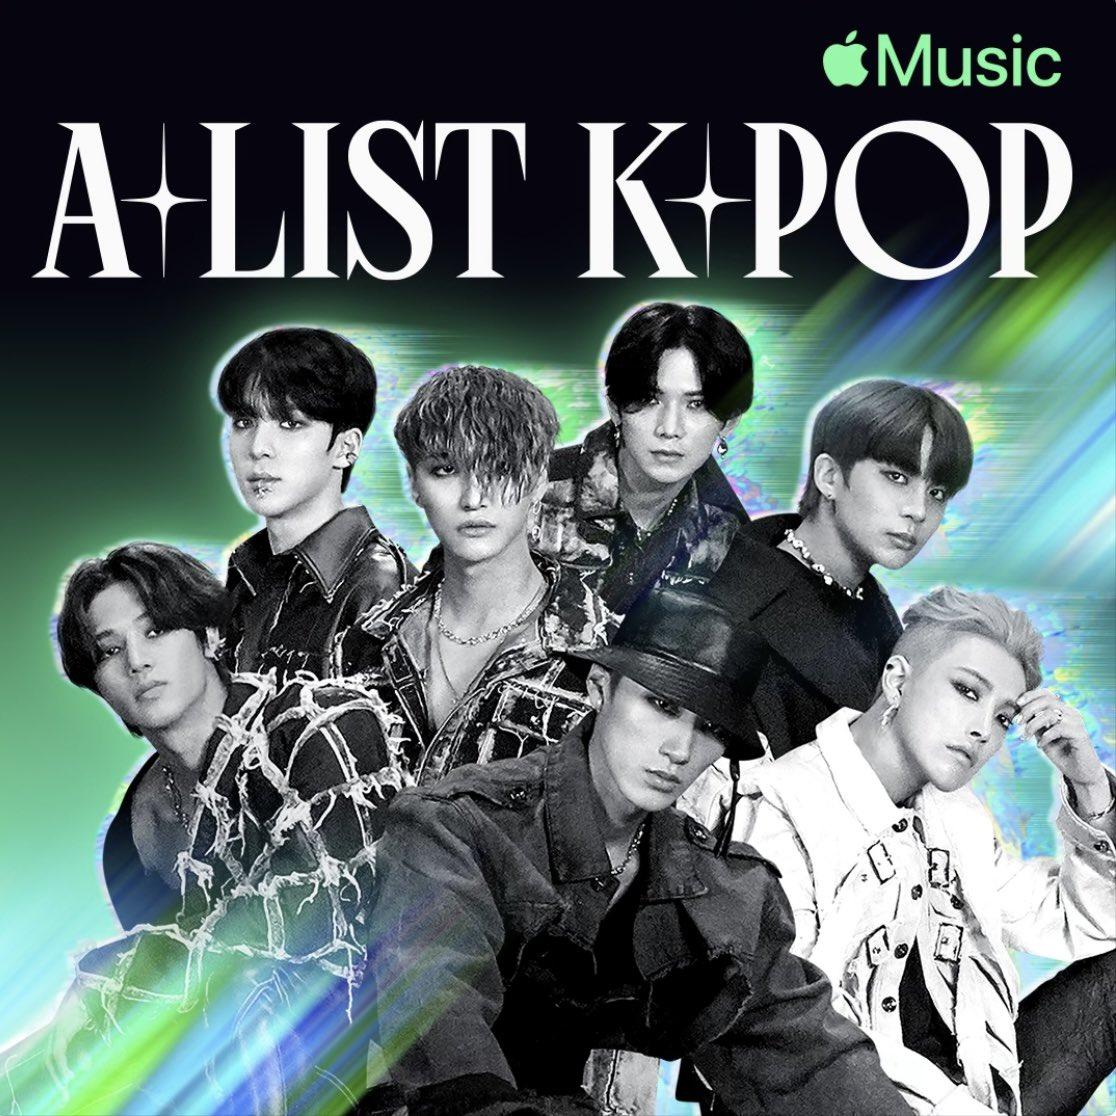 Apple Music 에디터가 엄선해 수시로 업데이트하는 K-Pop 인기곡 playlist   <A-List: K-Pop> 표지에 에이티즈🏴☠️🖤  #KINGTEEZ #ATEEZ #에이티즈